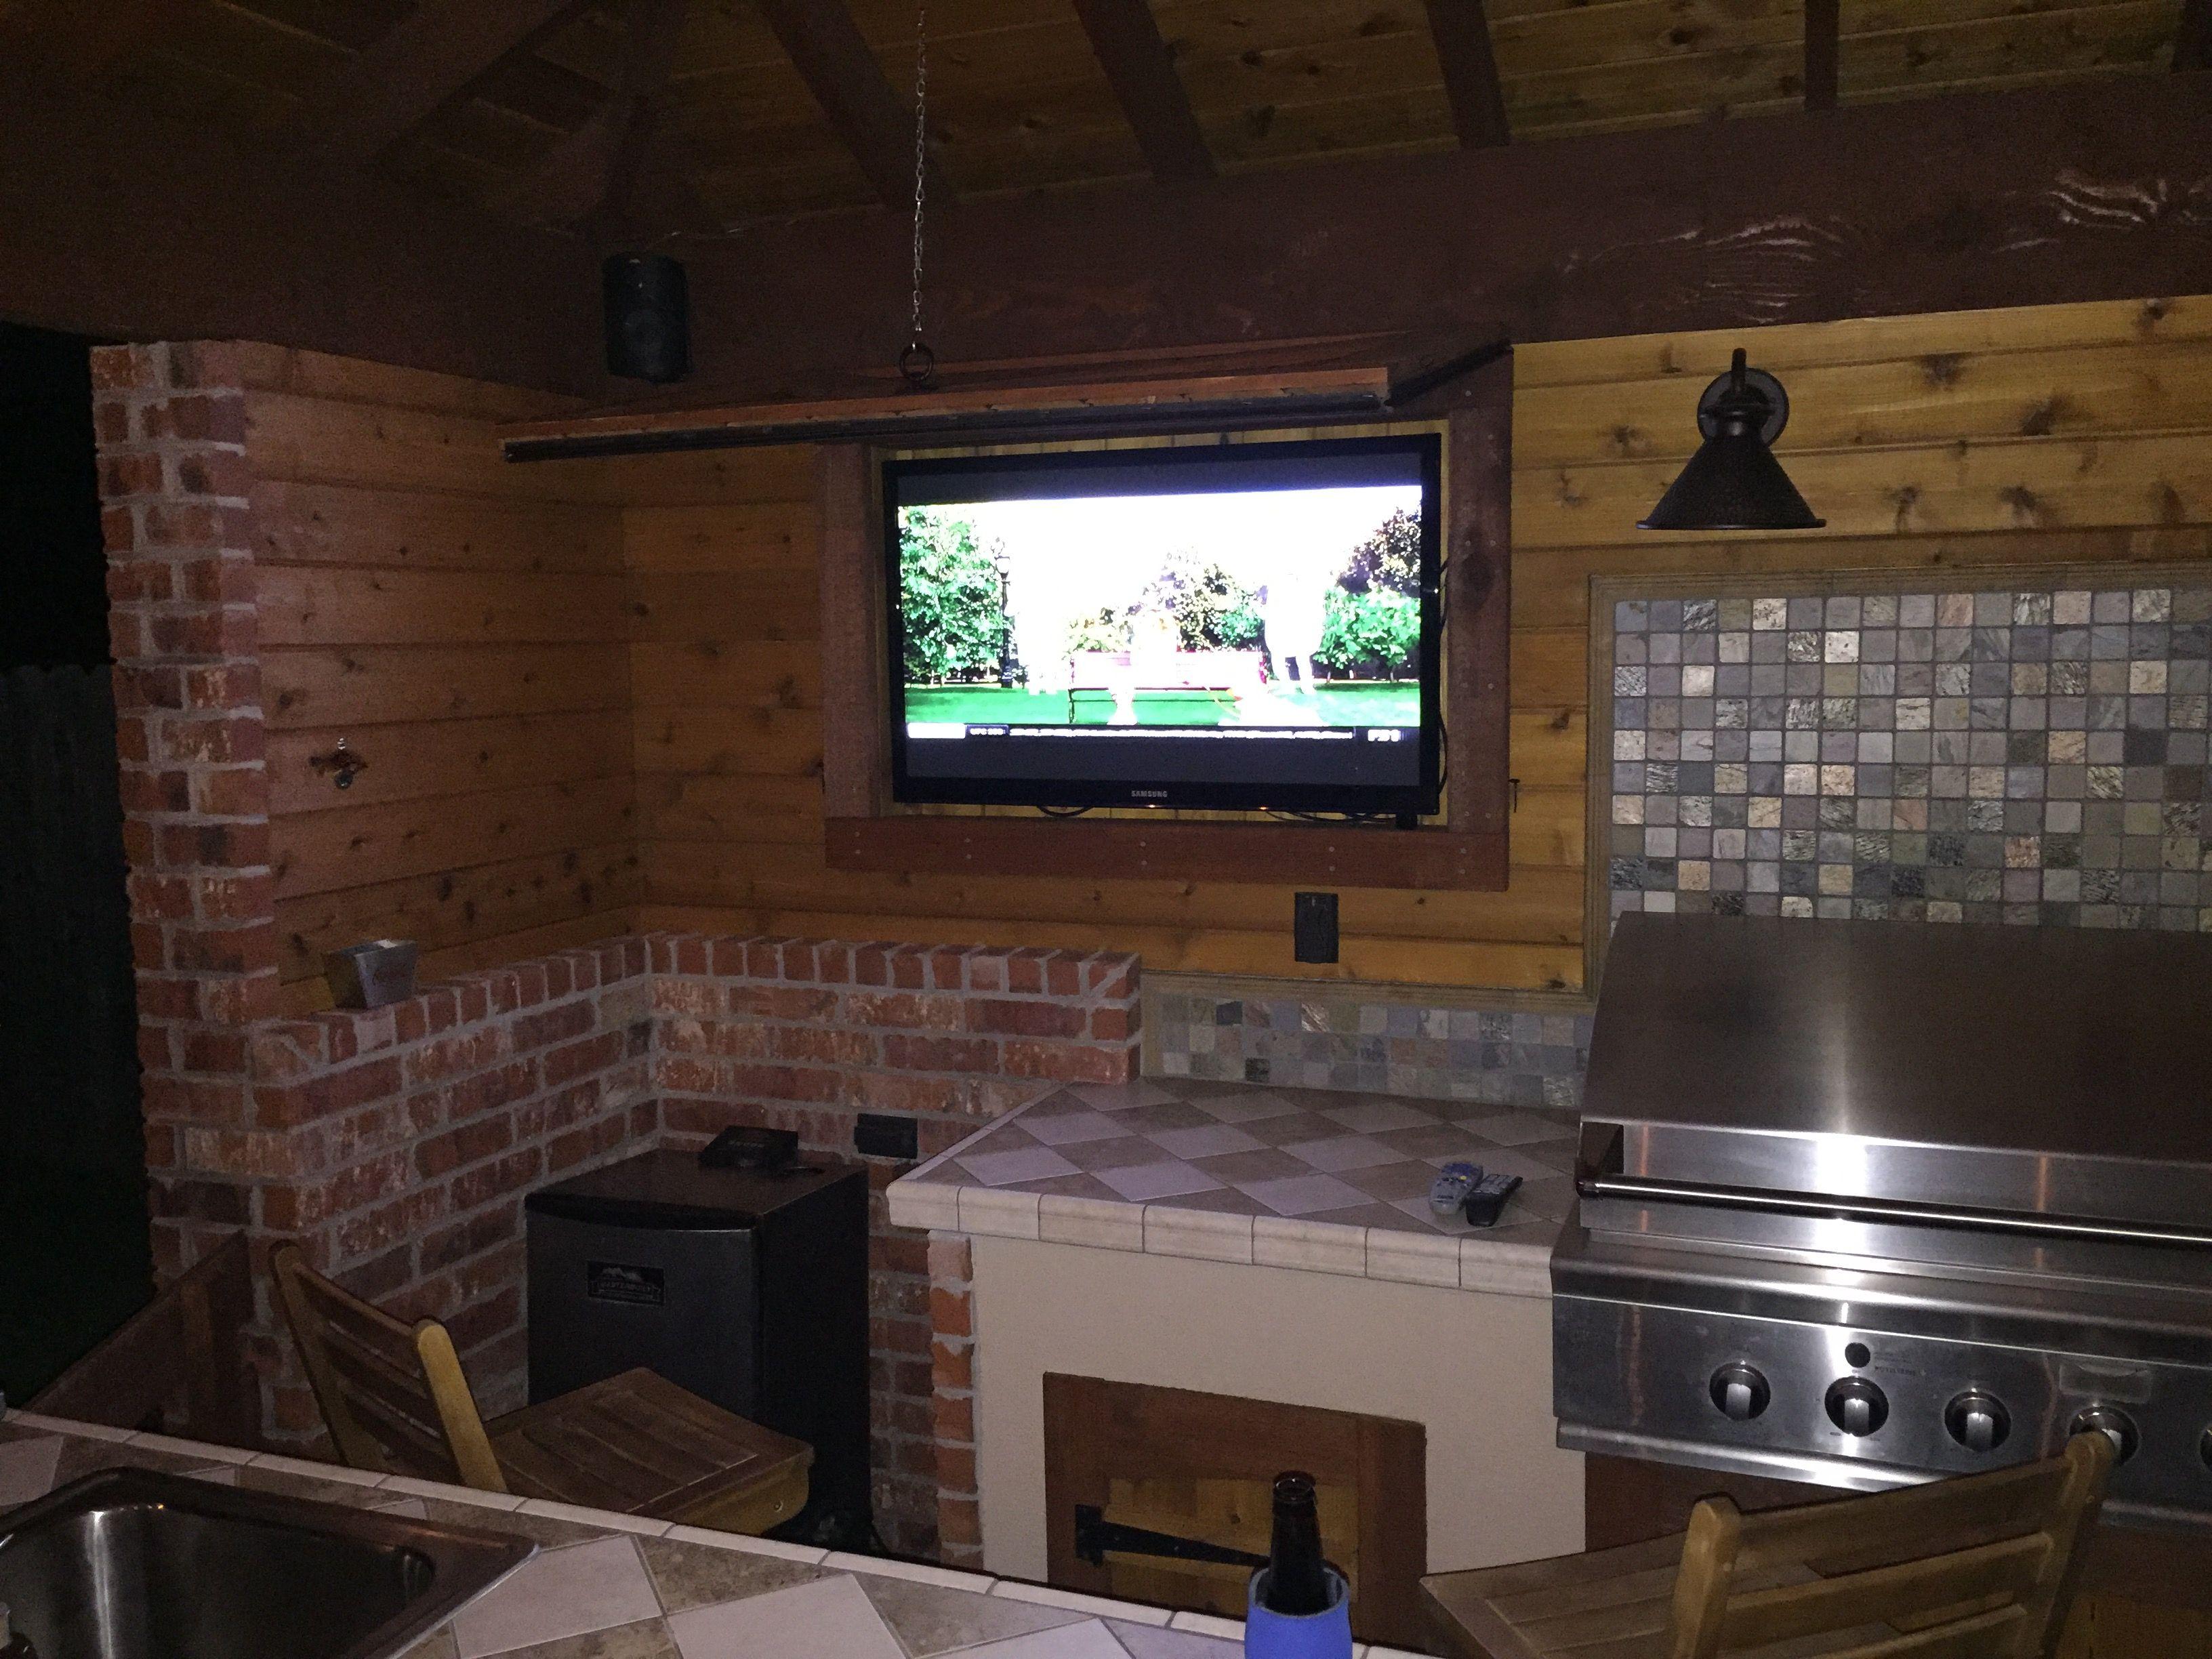 Outdoor Kitchen Diy Project Cedar By Ricky Tv Cabinet Diy Outdoor Kitchen Diy Kitchen Projects Outdoor Kitchen